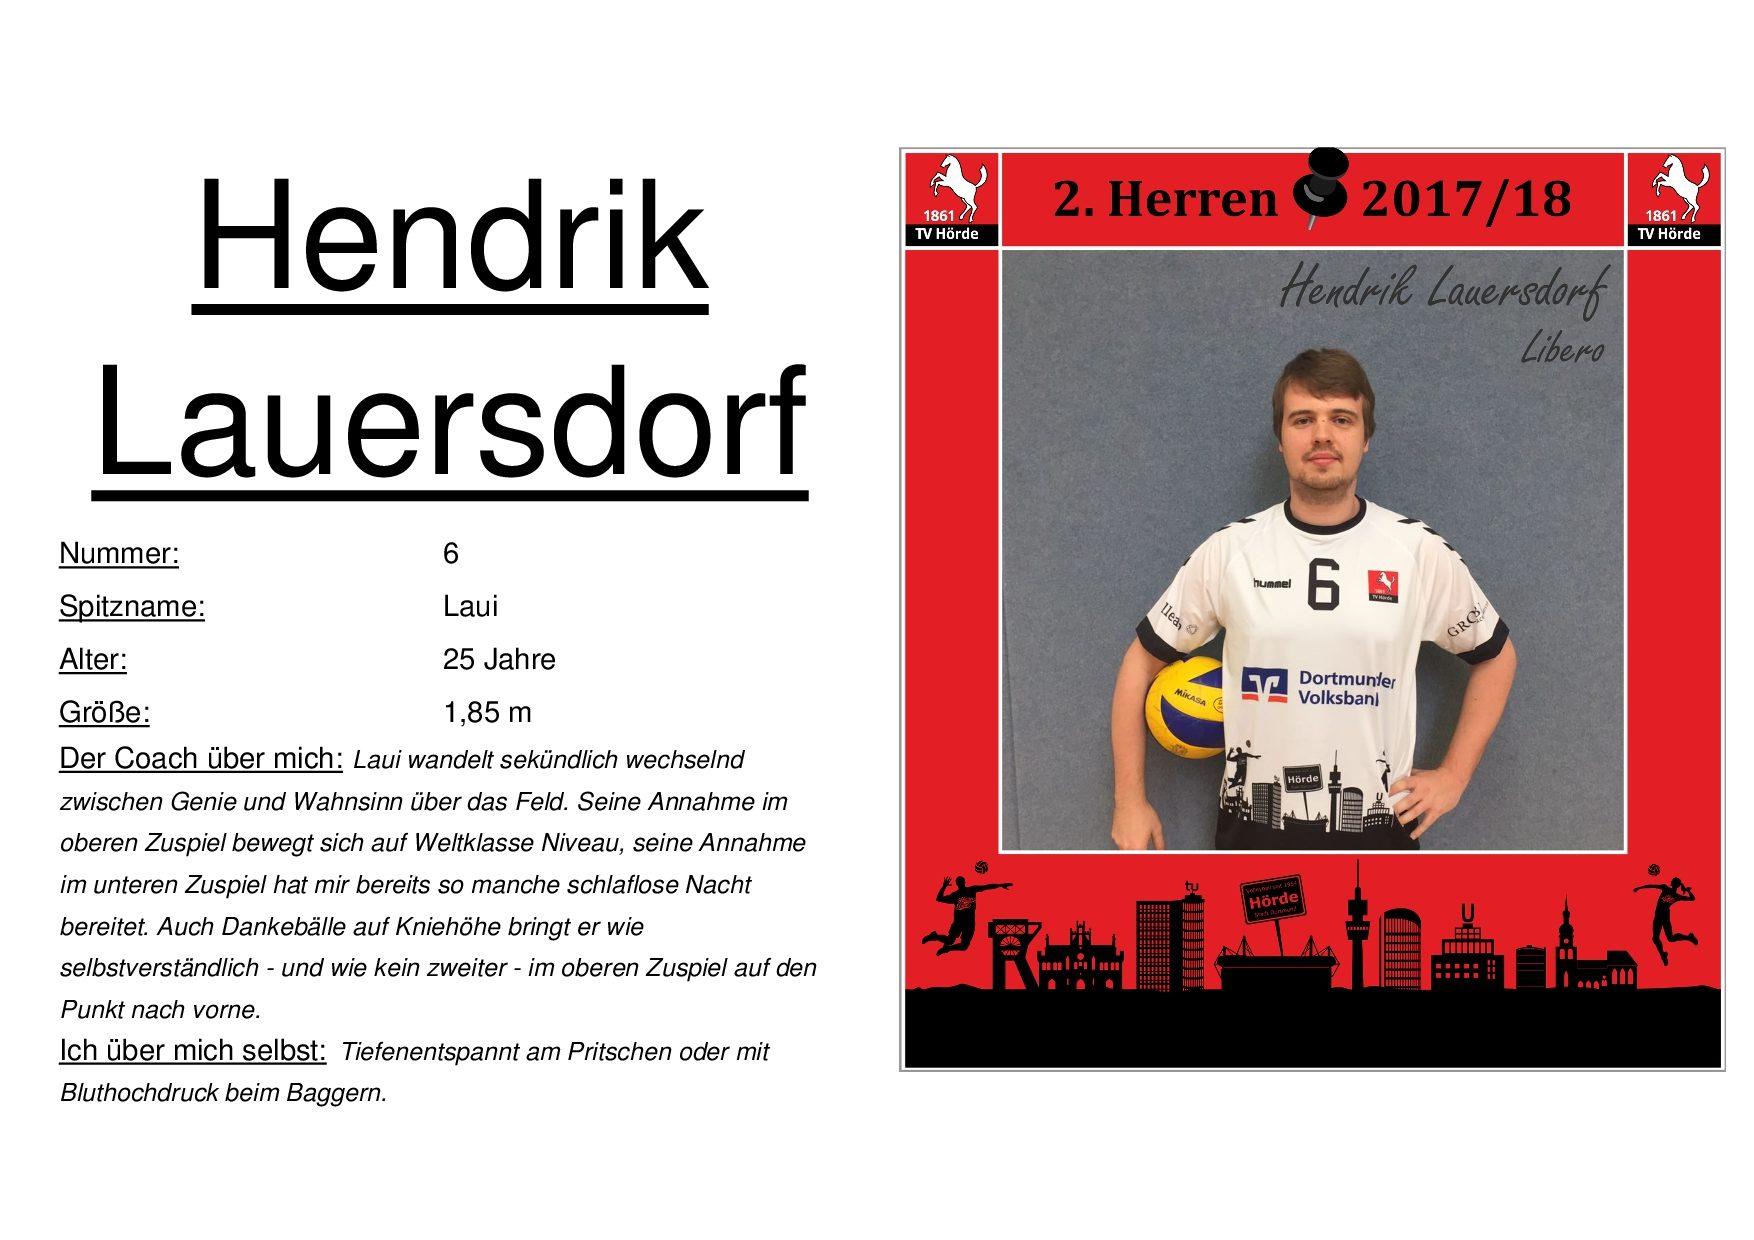 Hendrik Lauersdorf